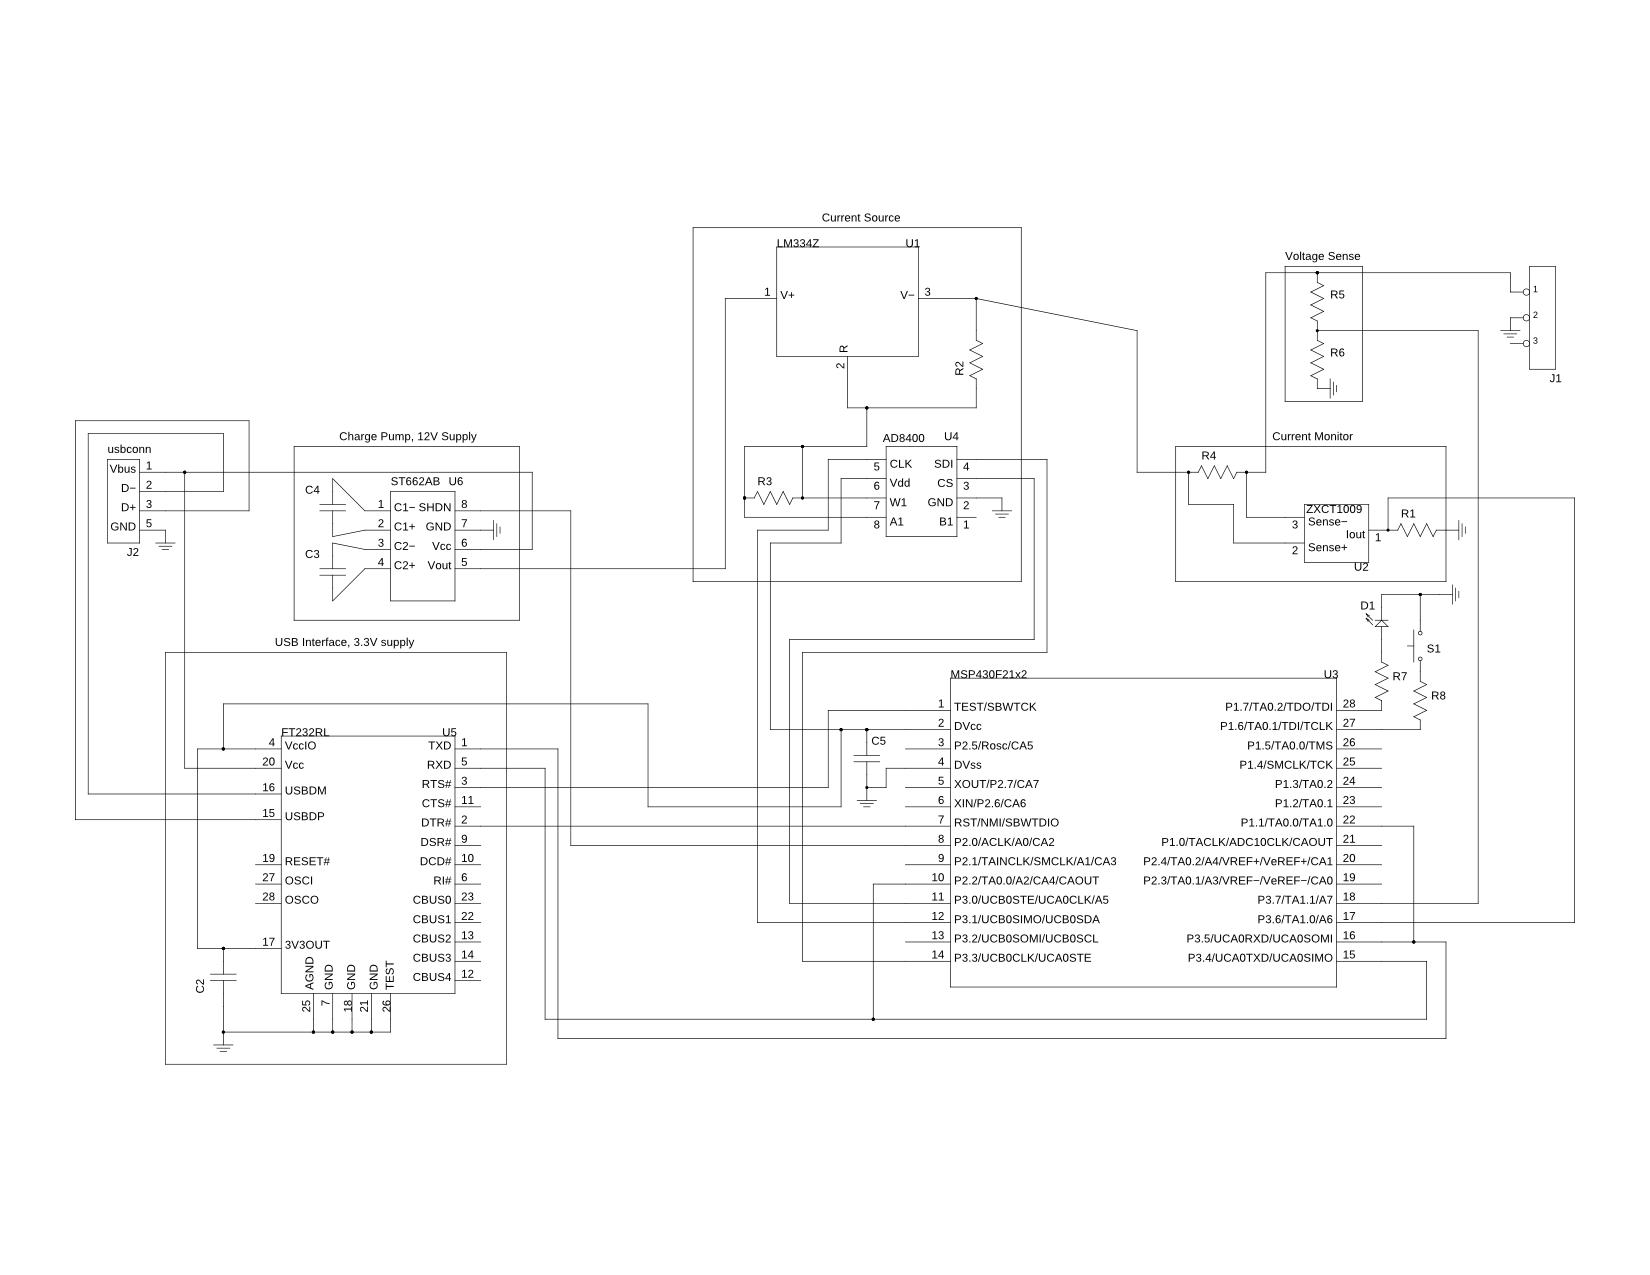 Tcds Diy Wiring Diagram Electrical Diagrams 277 Volt Neutral Tdcs Circuit Poemsrom Co Shawn Nock Version 2